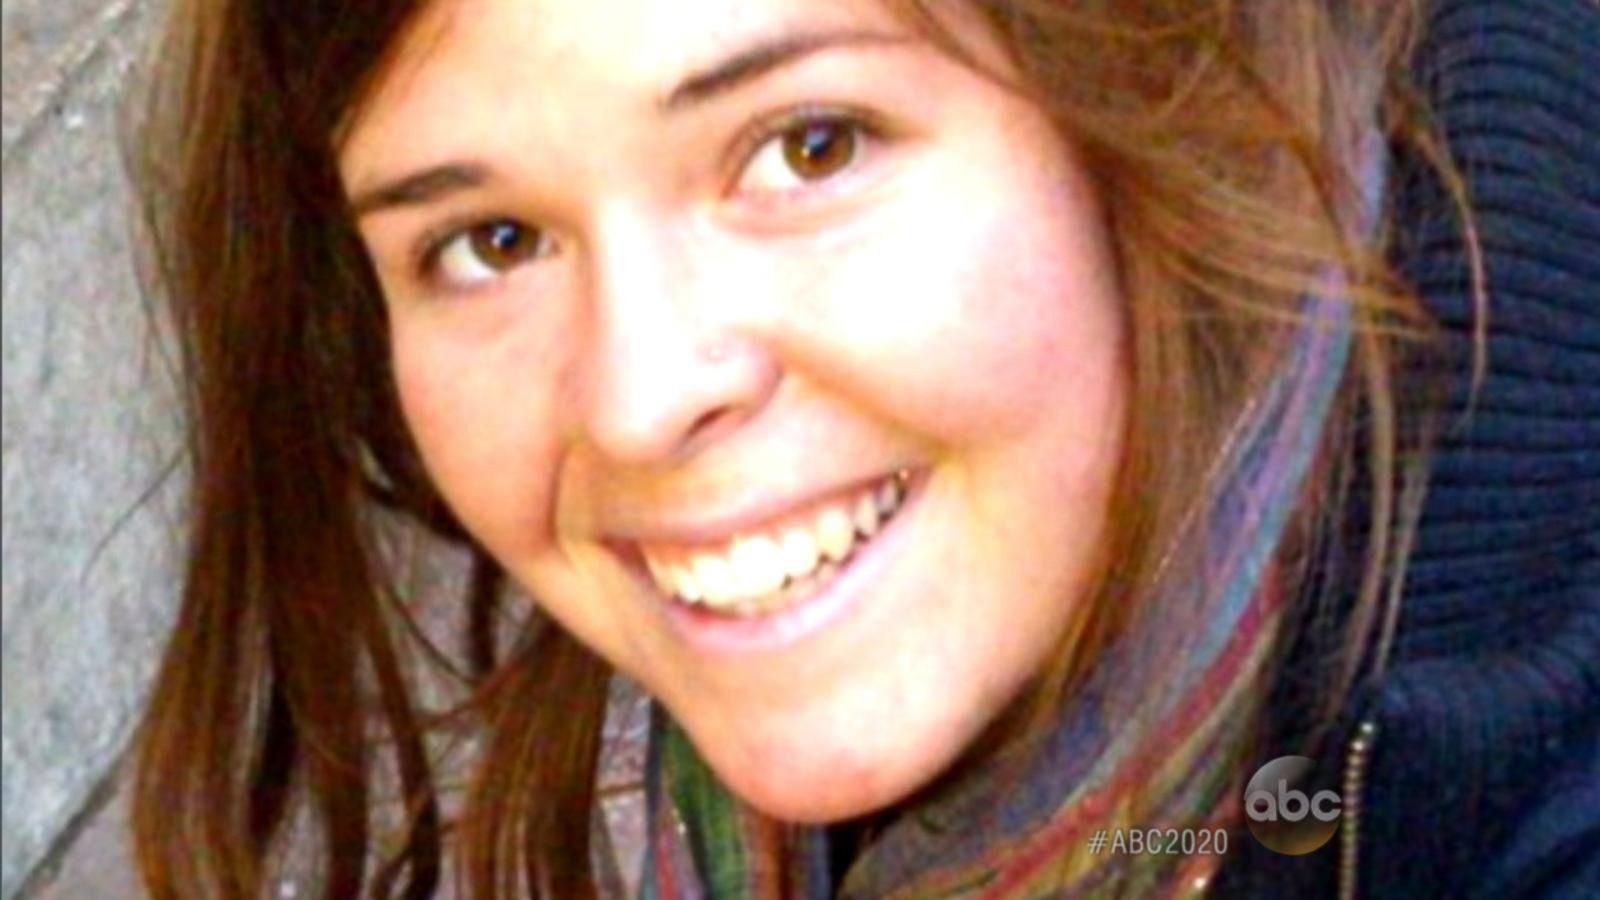 Part 5: Kayla's Sacrifice Allows ISIS Slave to Escape